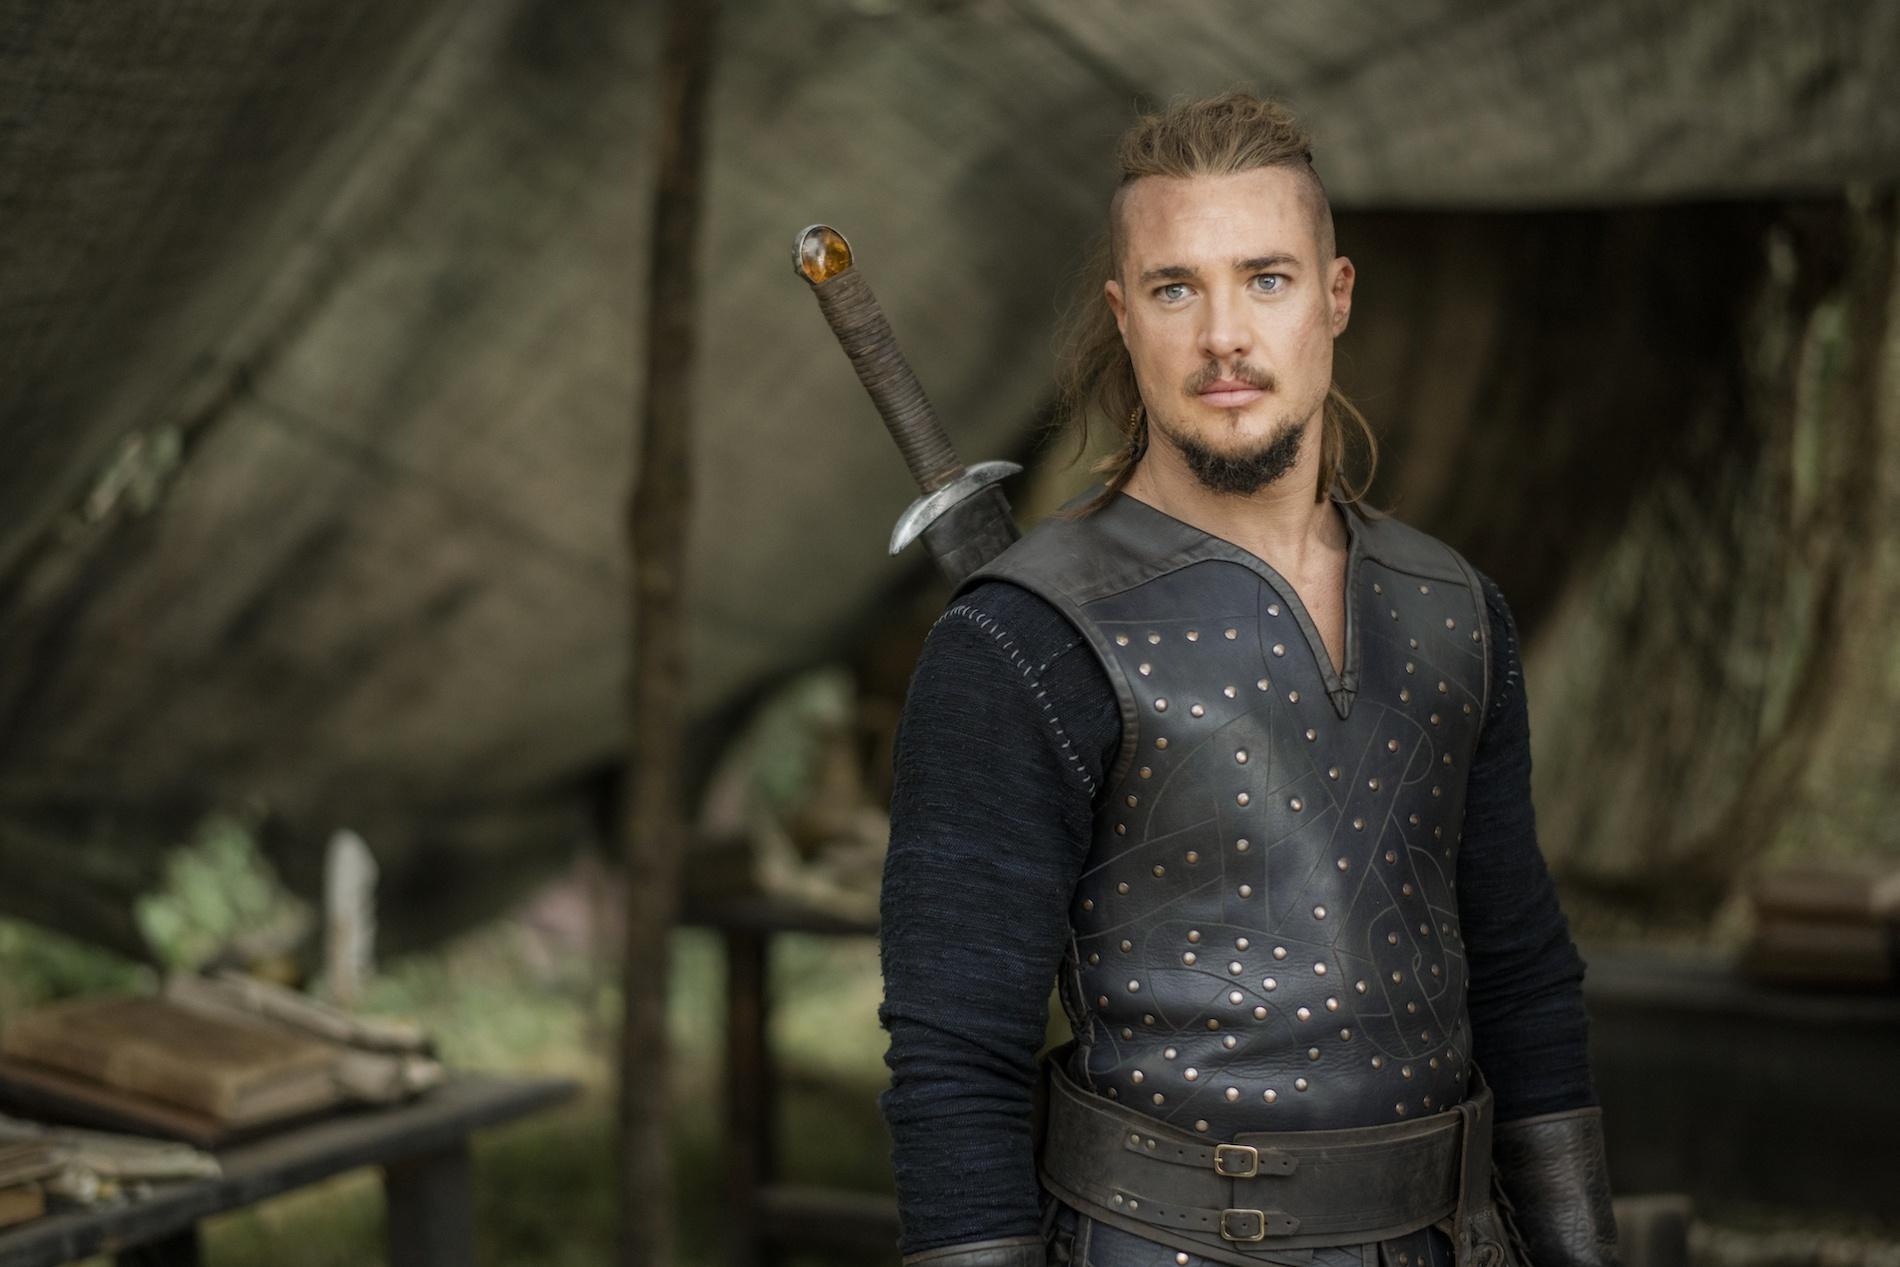 'The Last Kingdom' Star Alexander Dreymon Breaks Down His Acting Technique